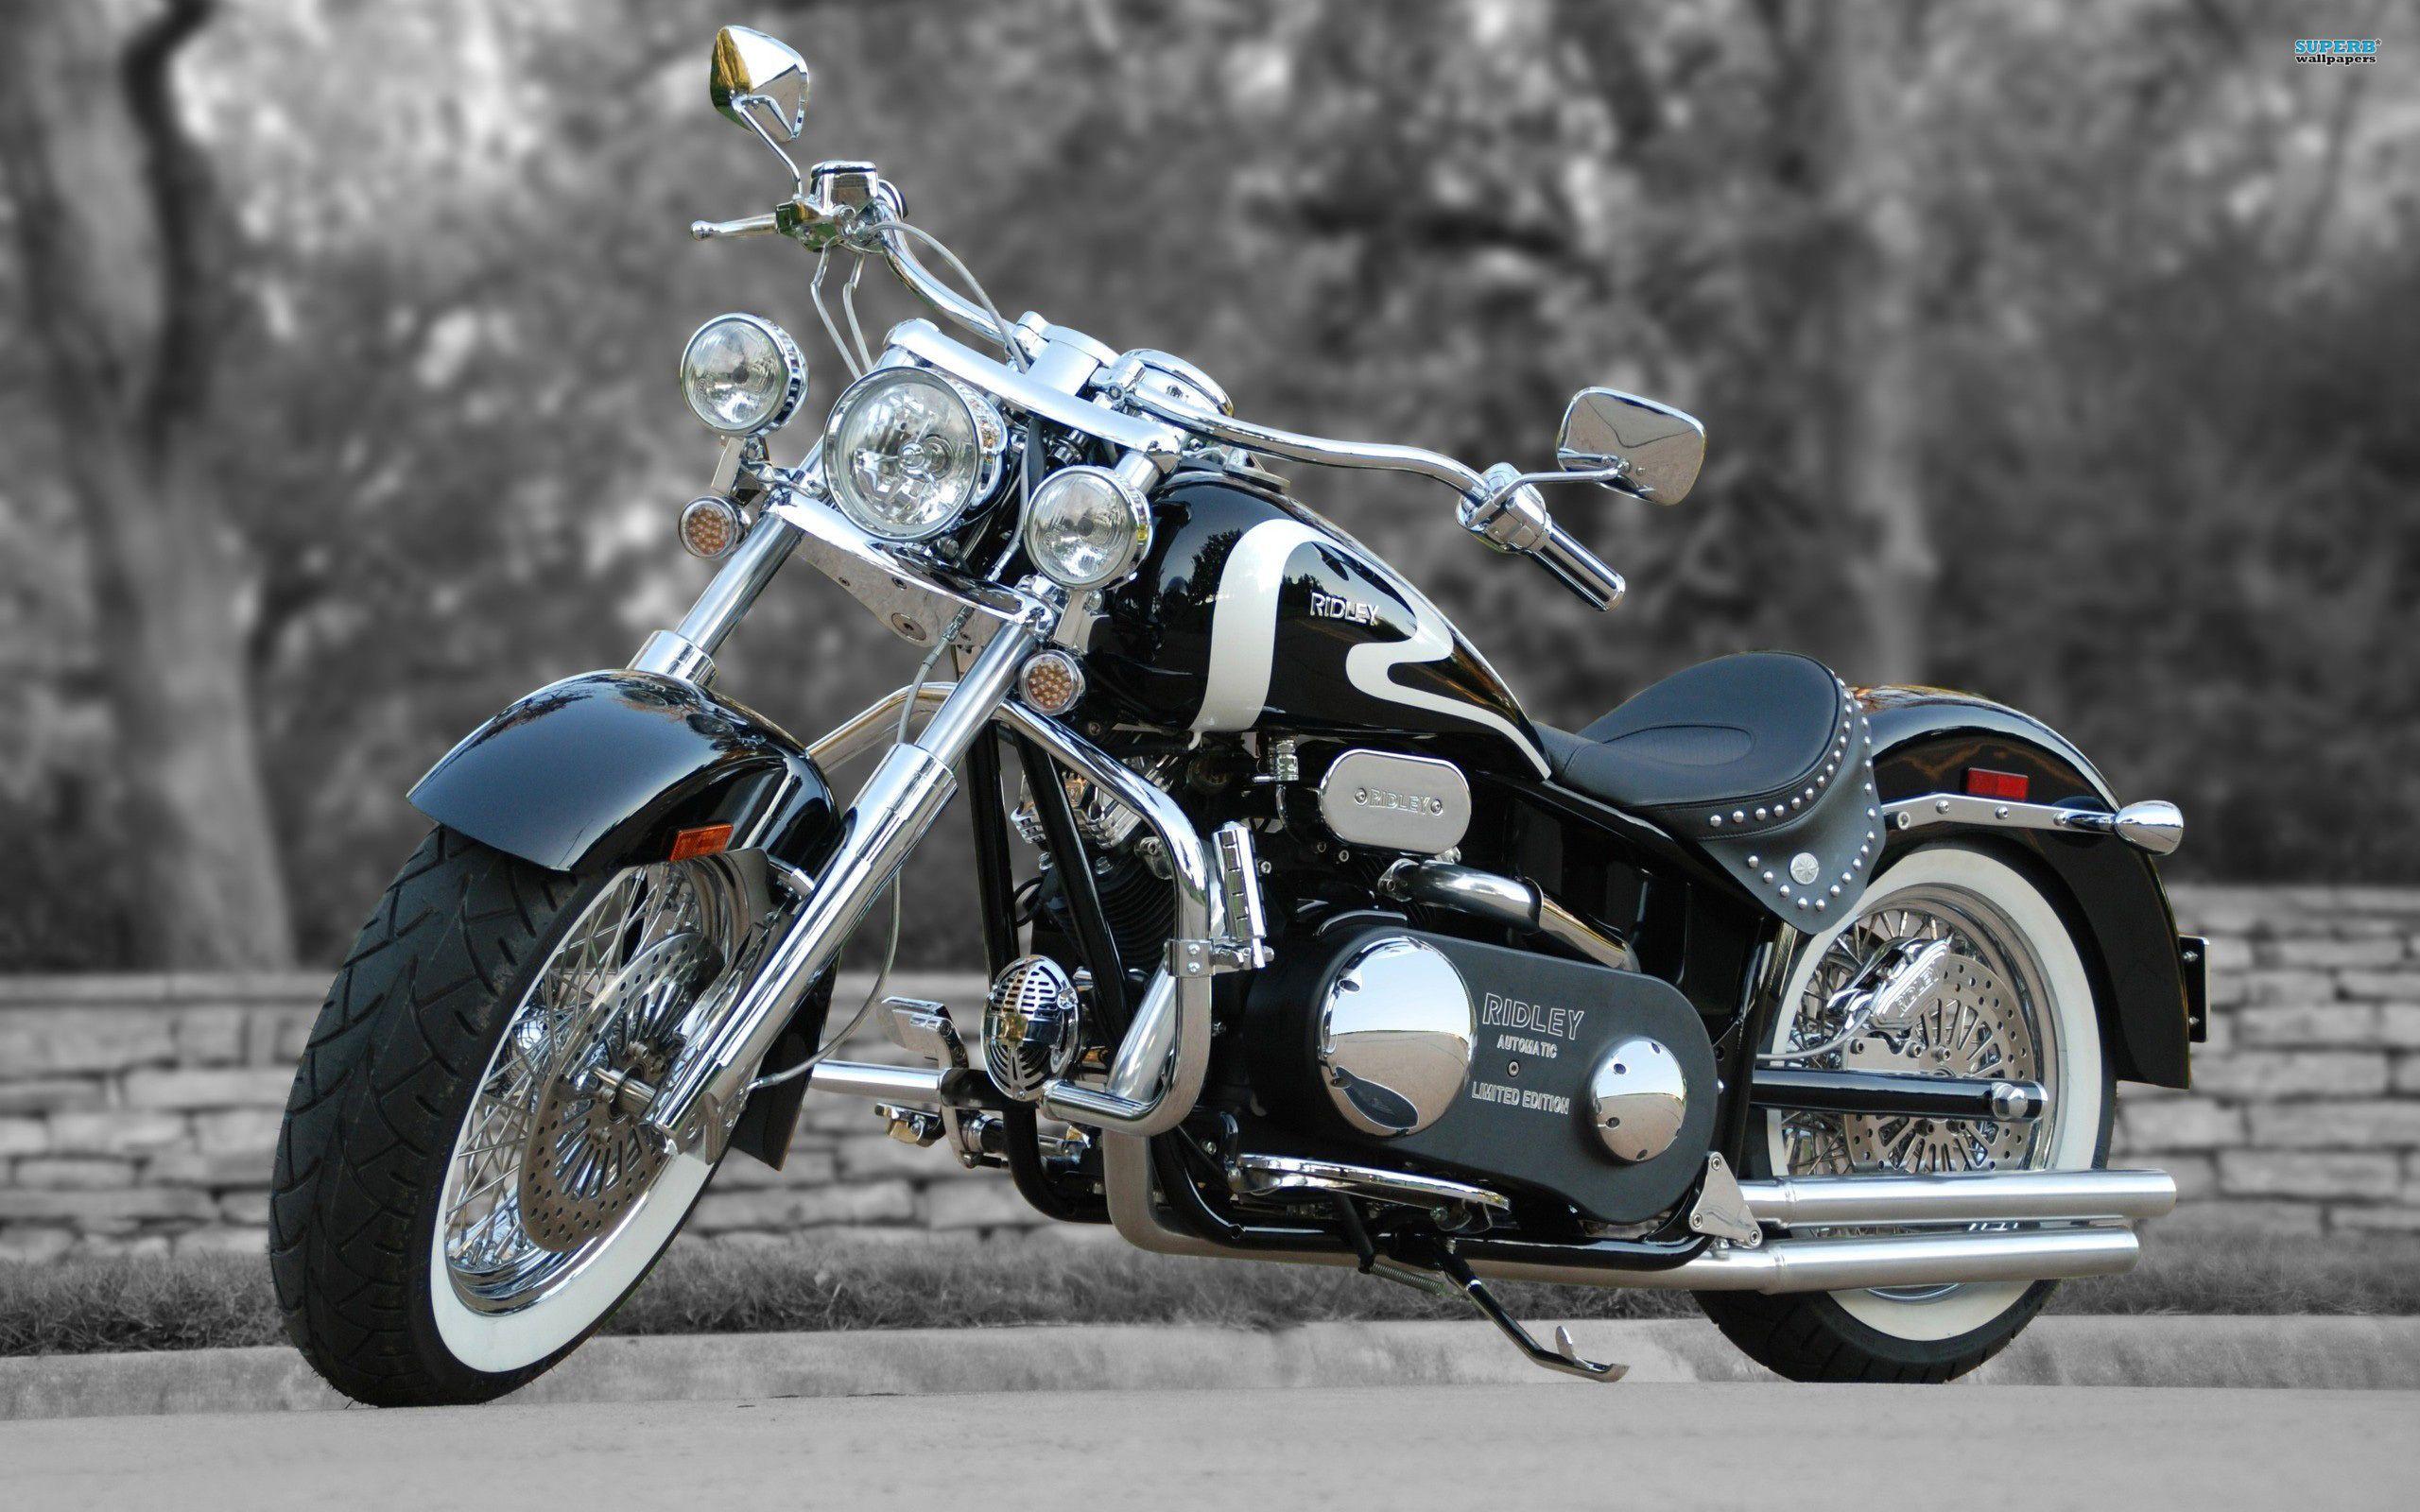 Harley Davidson E Girls Ridley Chopper Motorcycle 897778 2560x1600